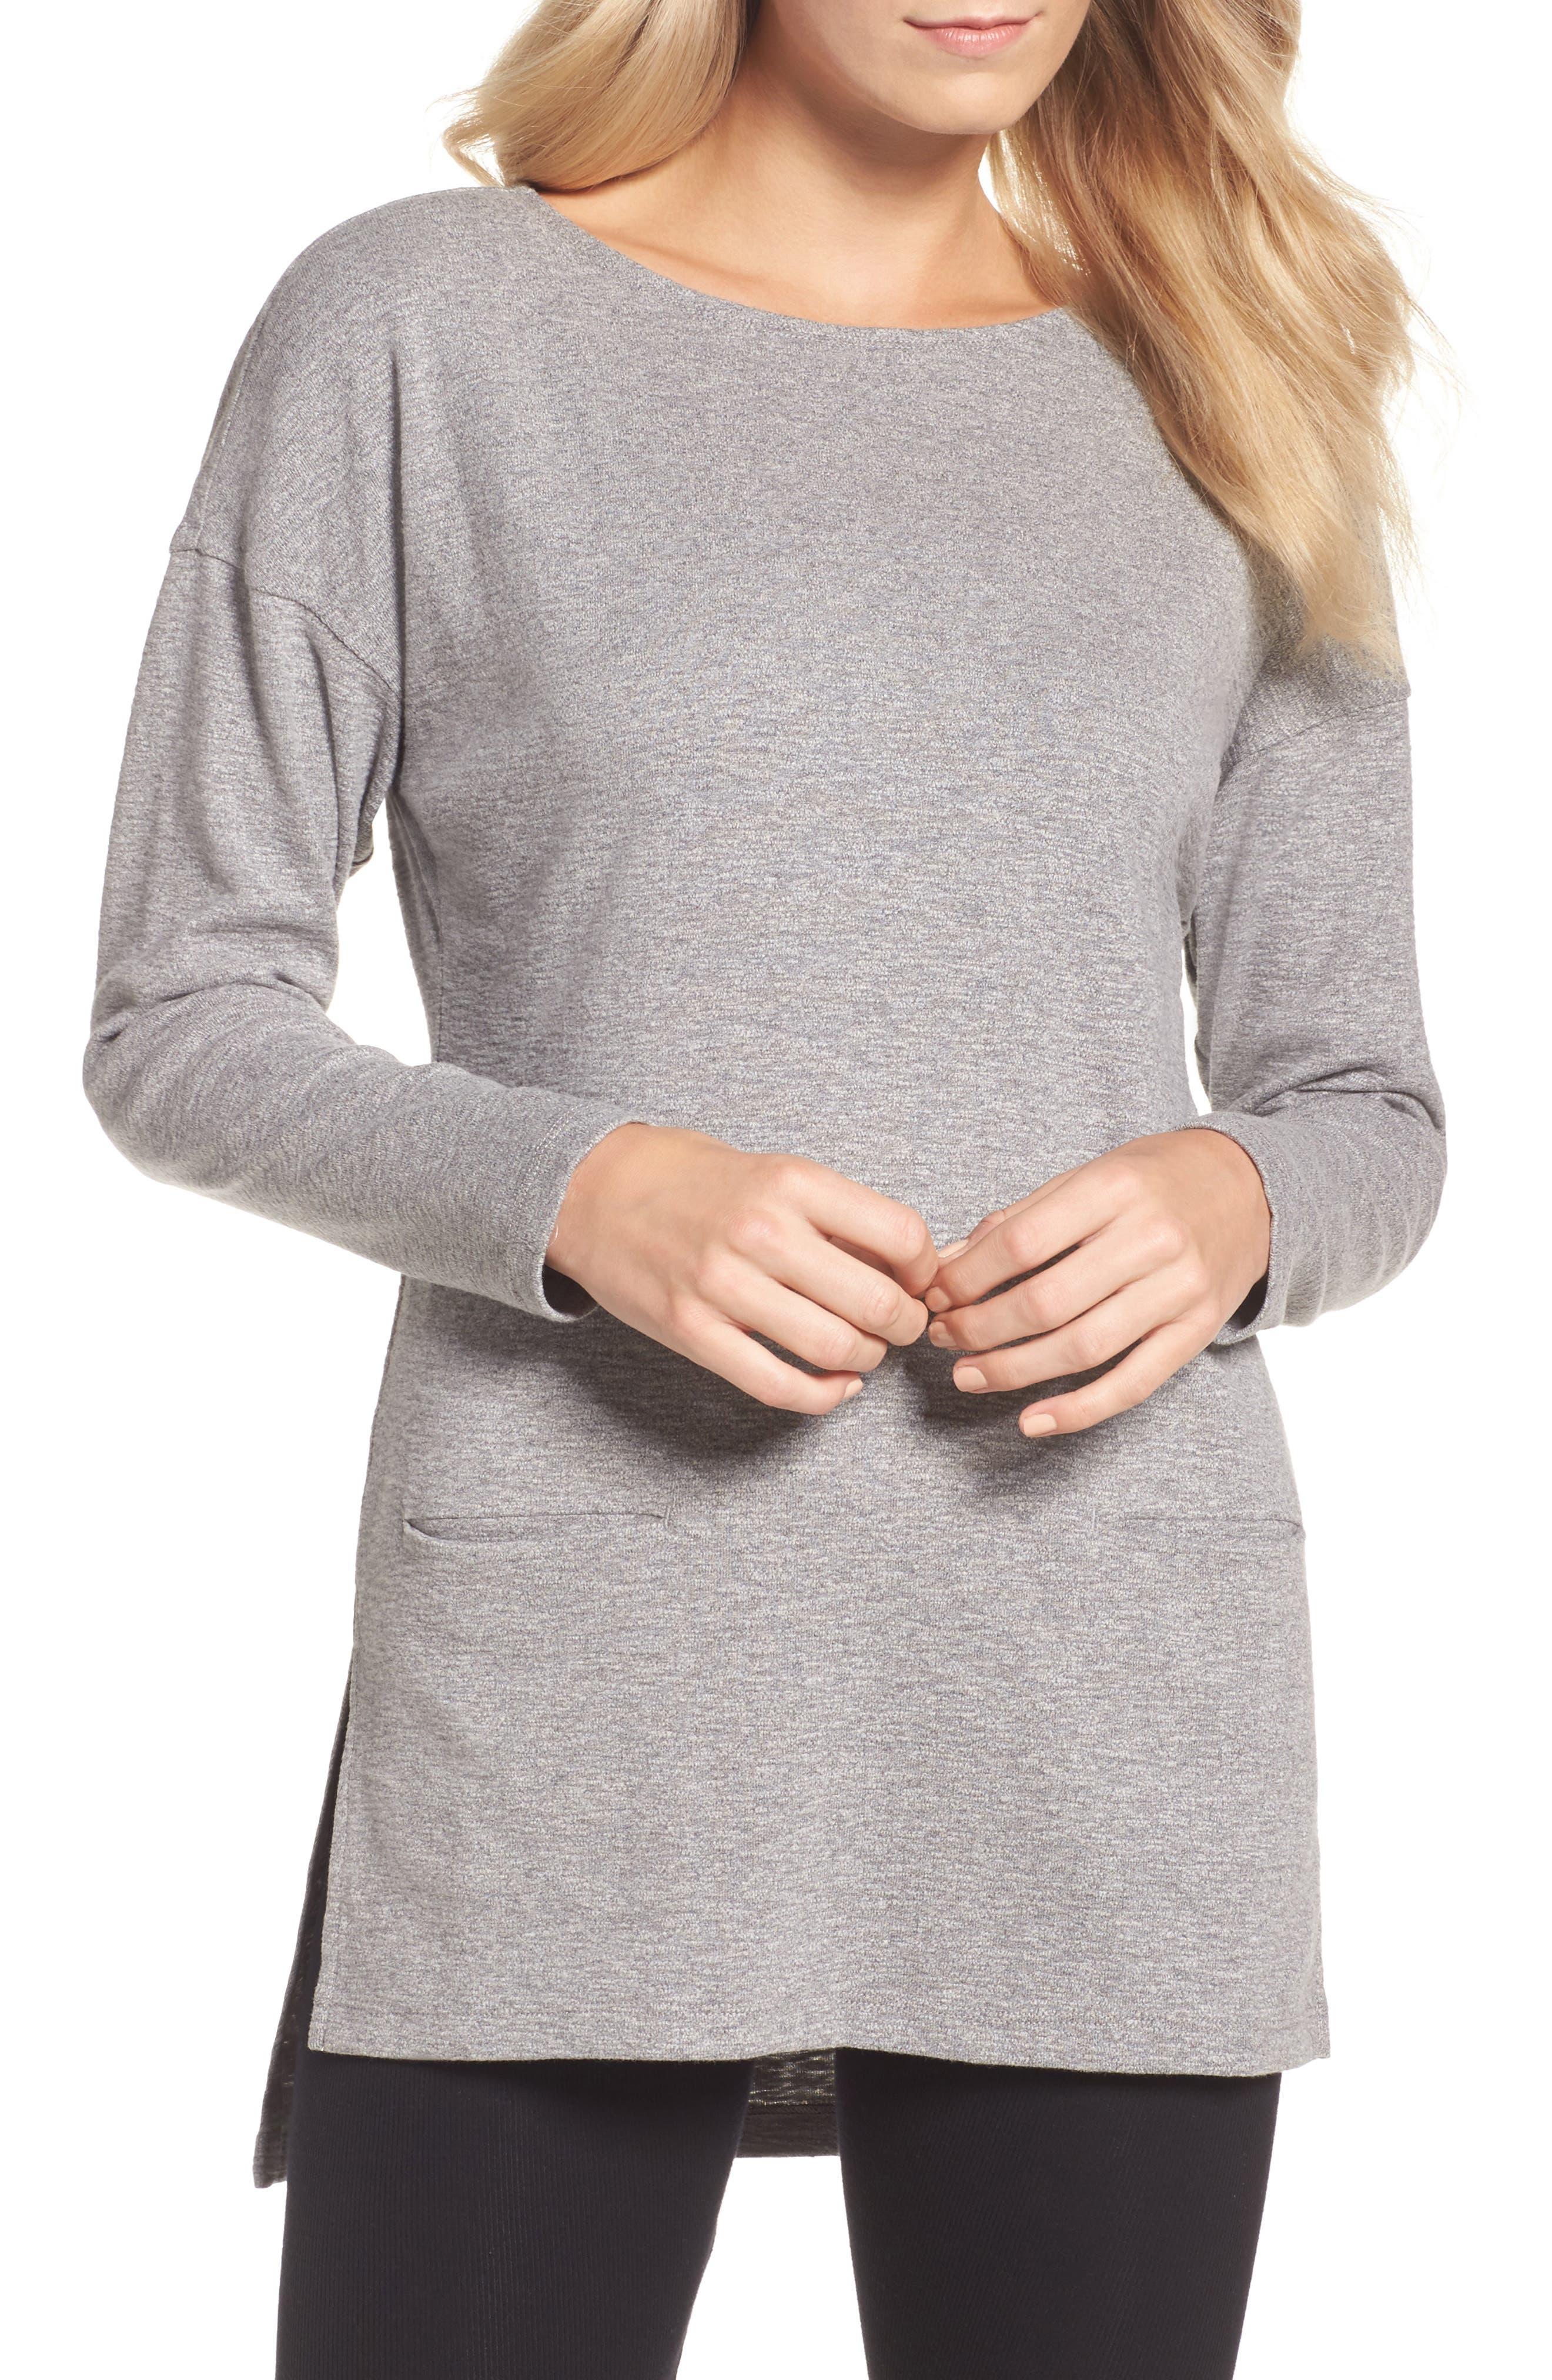 Luella High/Low Cotton Pullover,                             Main thumbnail 1, color,                             041